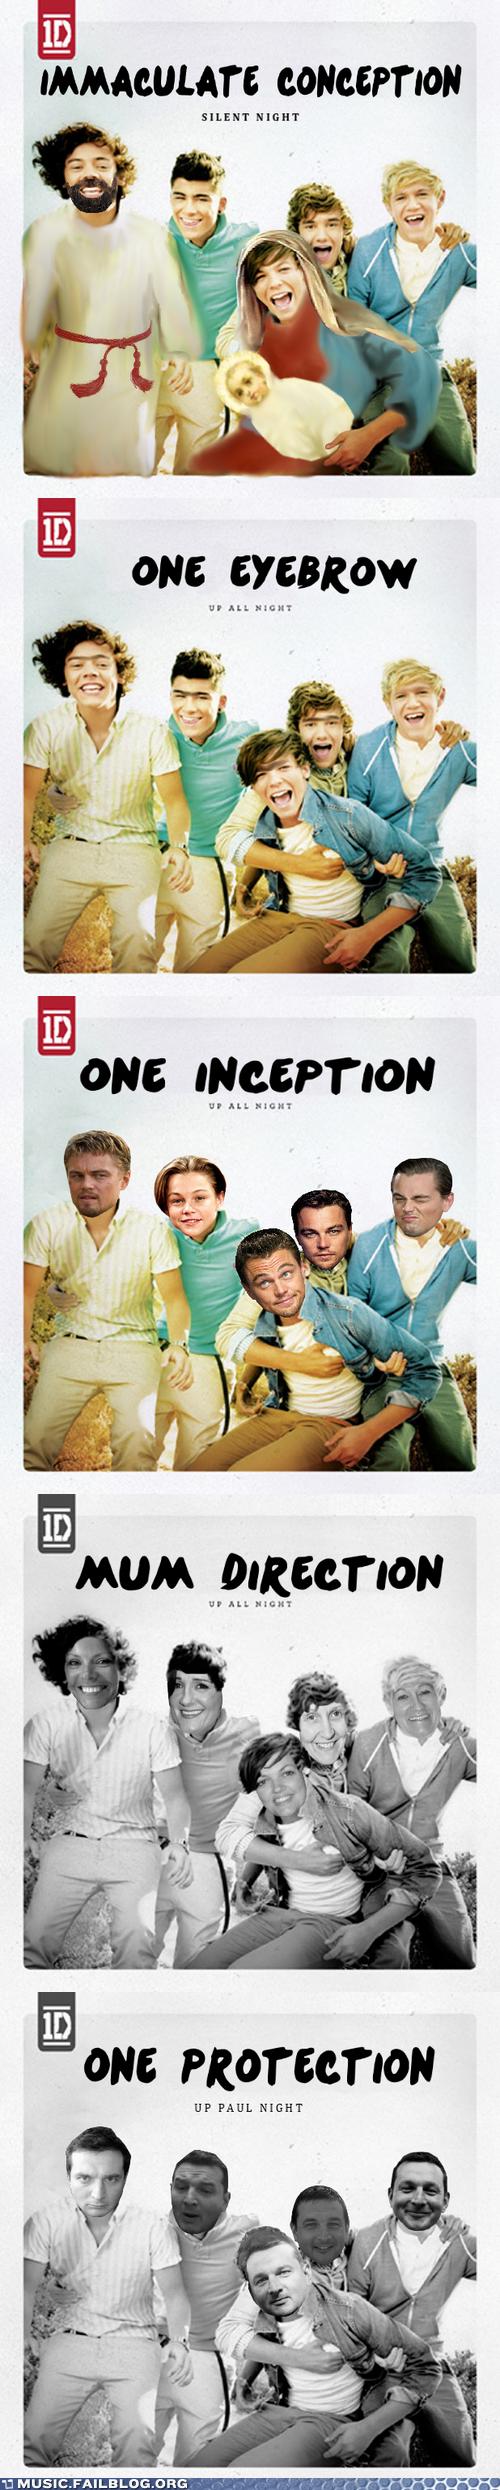 Music FAILS: Five Shops, One Direction